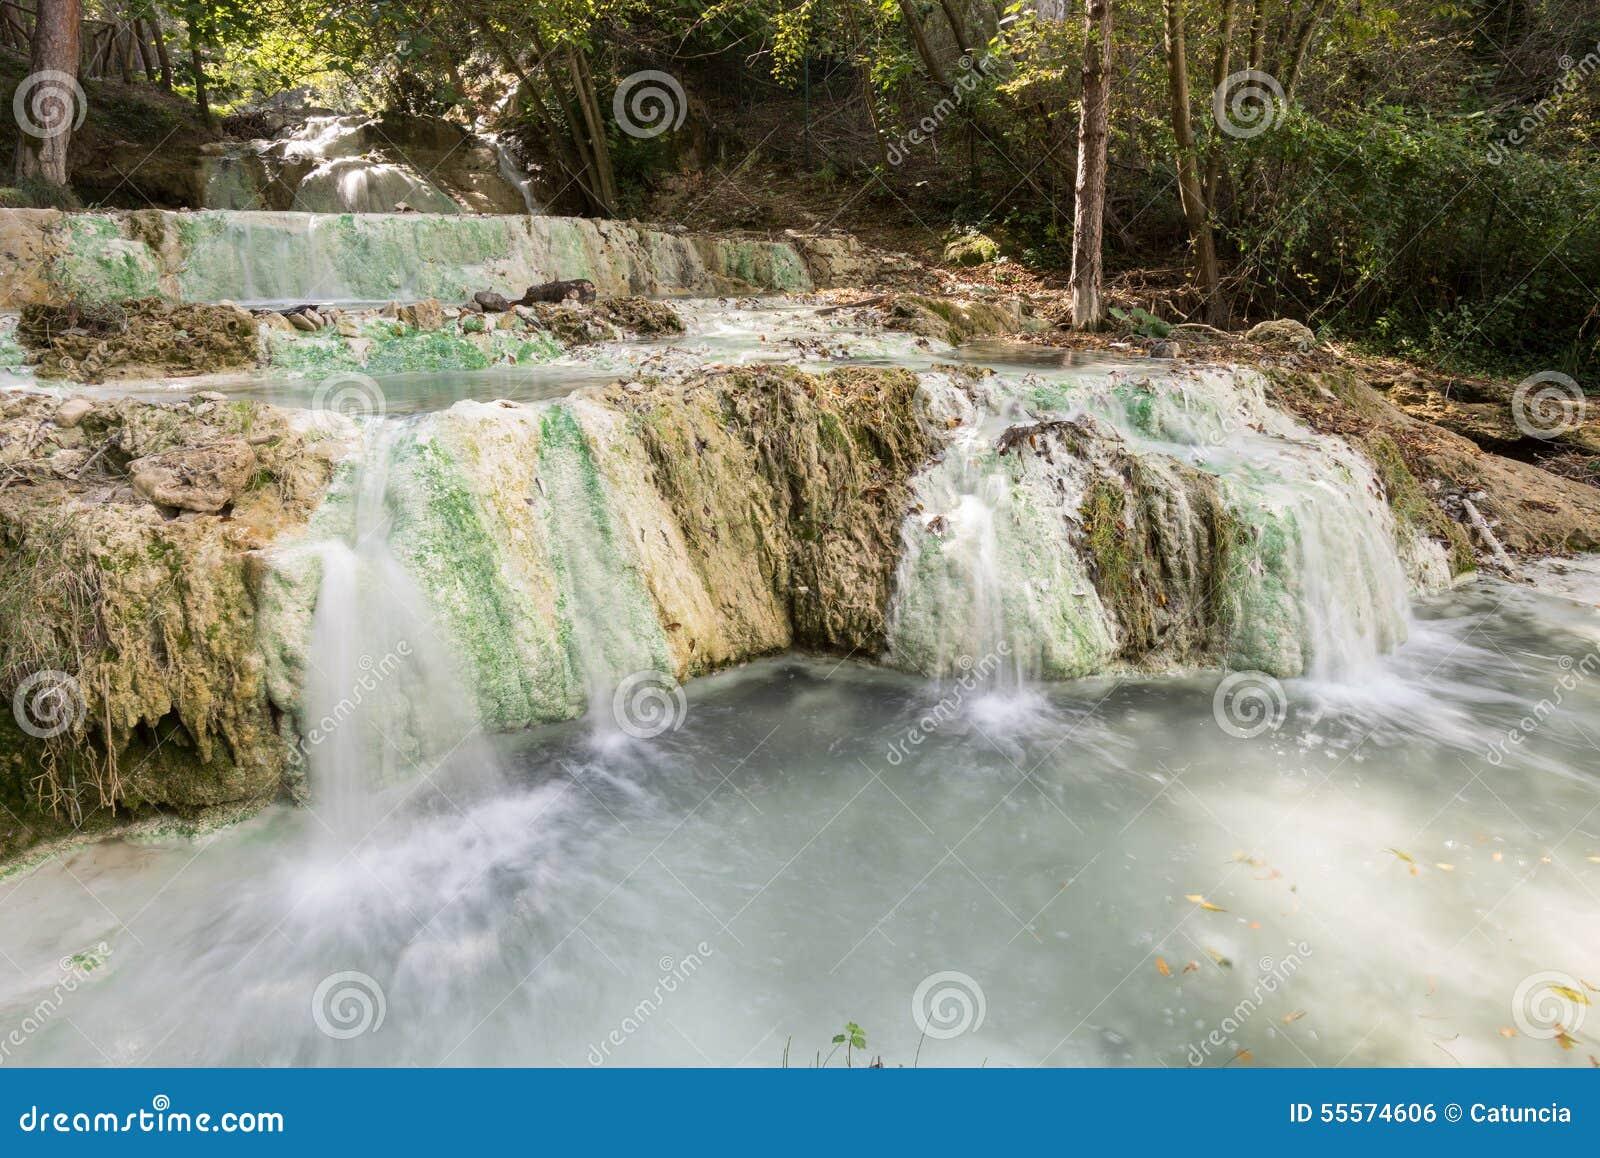 https://thumbs.dreamstime.com/z/fosso-bianco-hot-springs-bagni-san-filippo-terme-tuscany-province-siena-italy-55574606.jpg